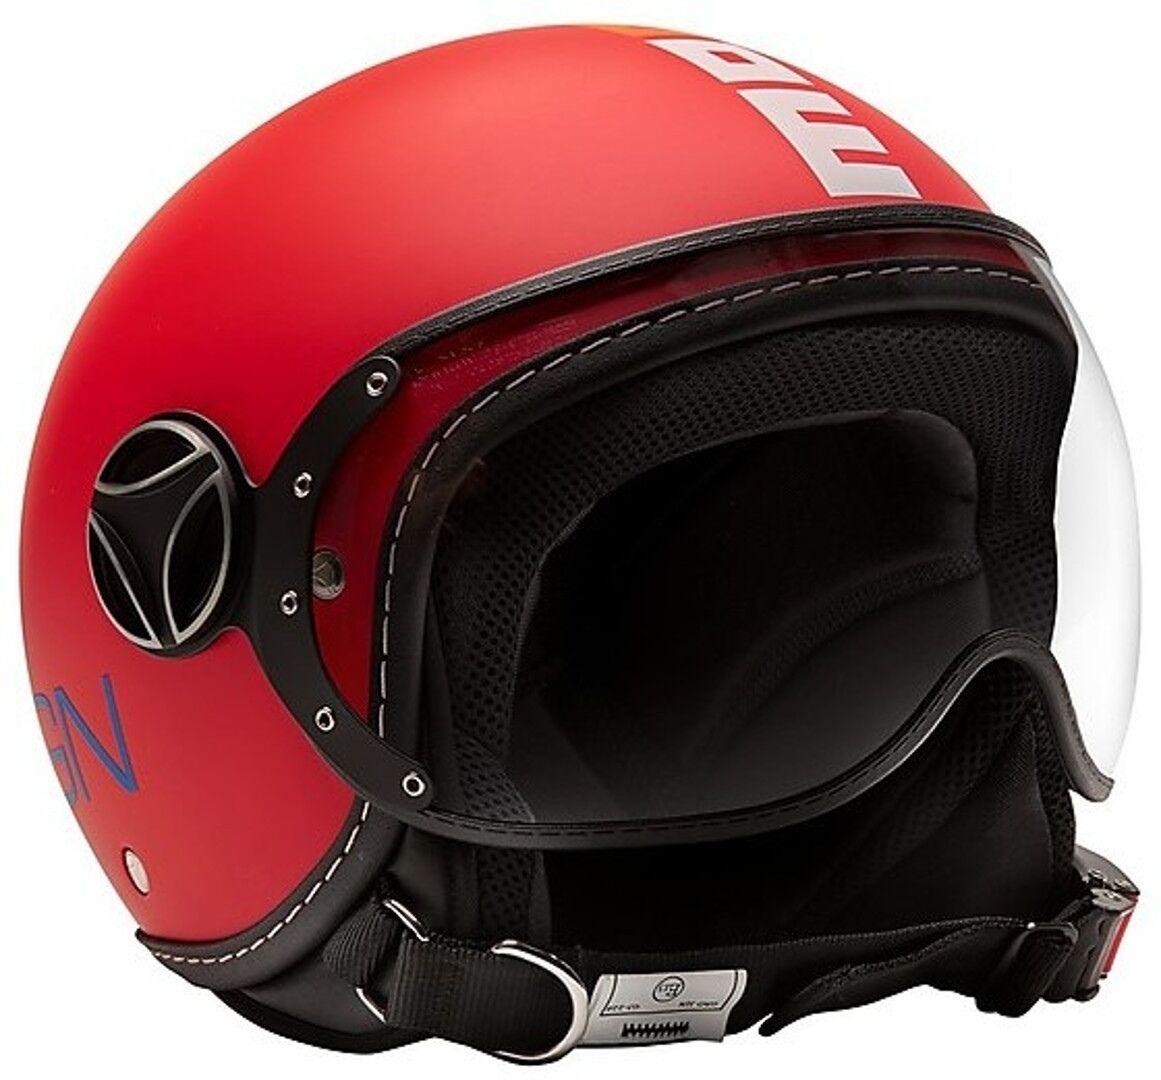 MOMO FGTR Baby Kids Jet Helmet Casco de jet para niños